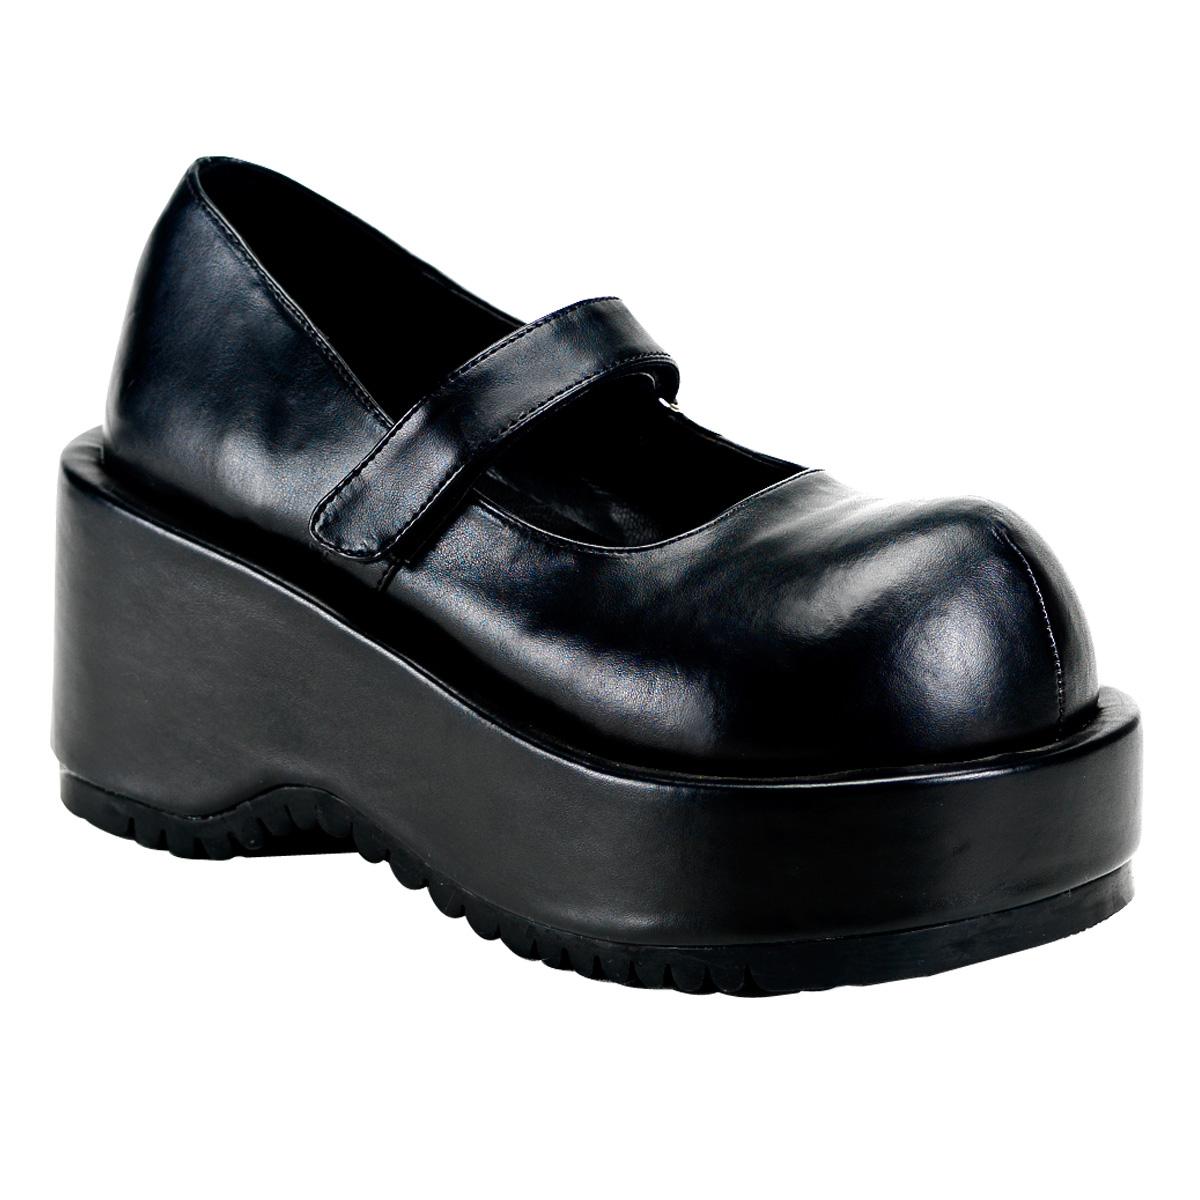 Demonia Dolly  01 Punk 3 1/4 P/F Gótico Punk 01 Zapatos de plataforma alternativa b3d7ff